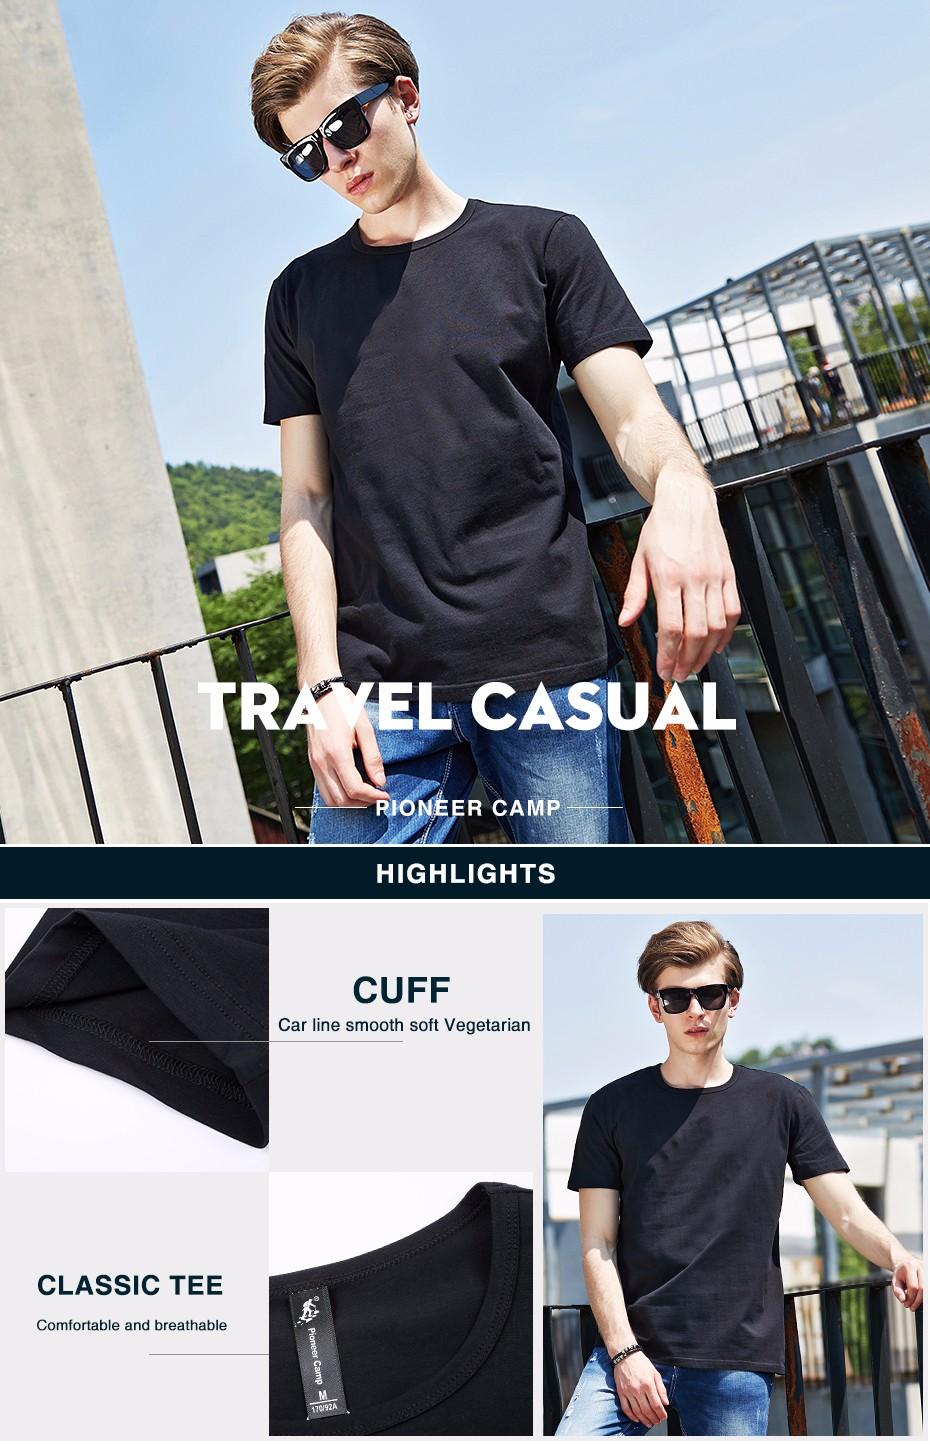 HTB1M6y.KXXXXXXUXFXXq6xXFXXXR - Pioneer Camp t shirt men brand clothing summer solid t-shirt male casual tshirt fashion mens short sleeve plus size 4XL